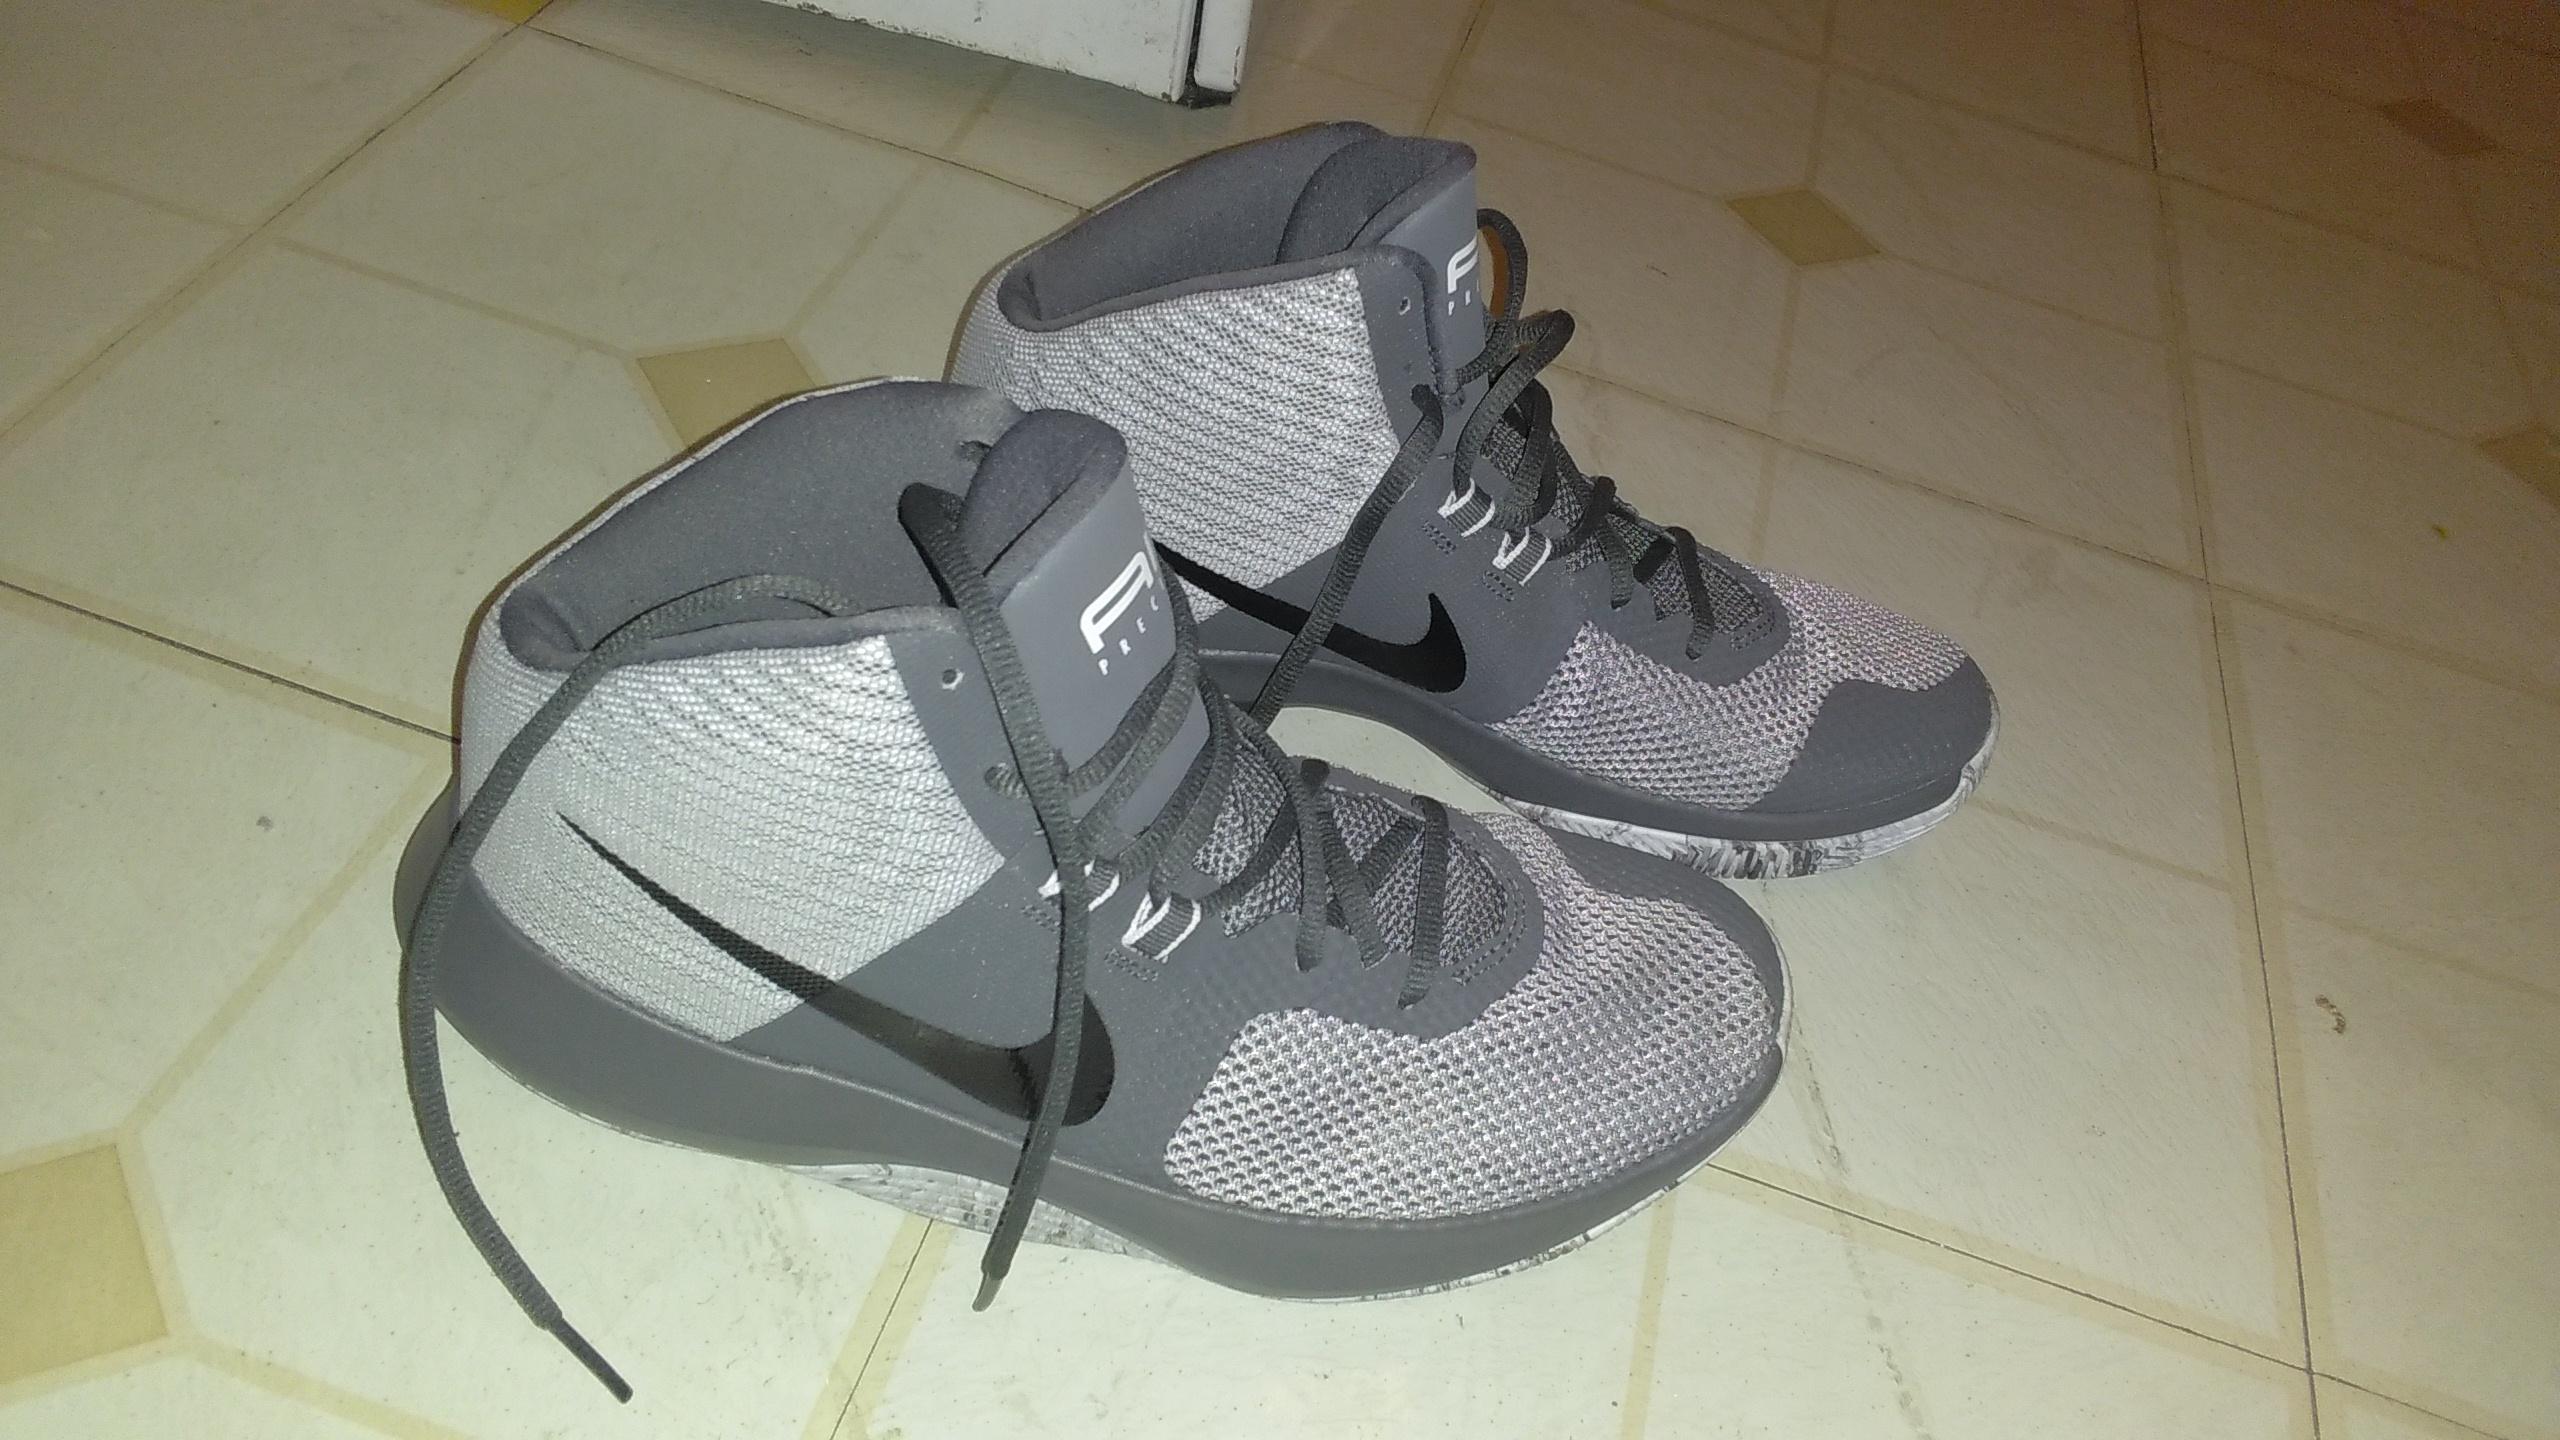 New Nike size 9